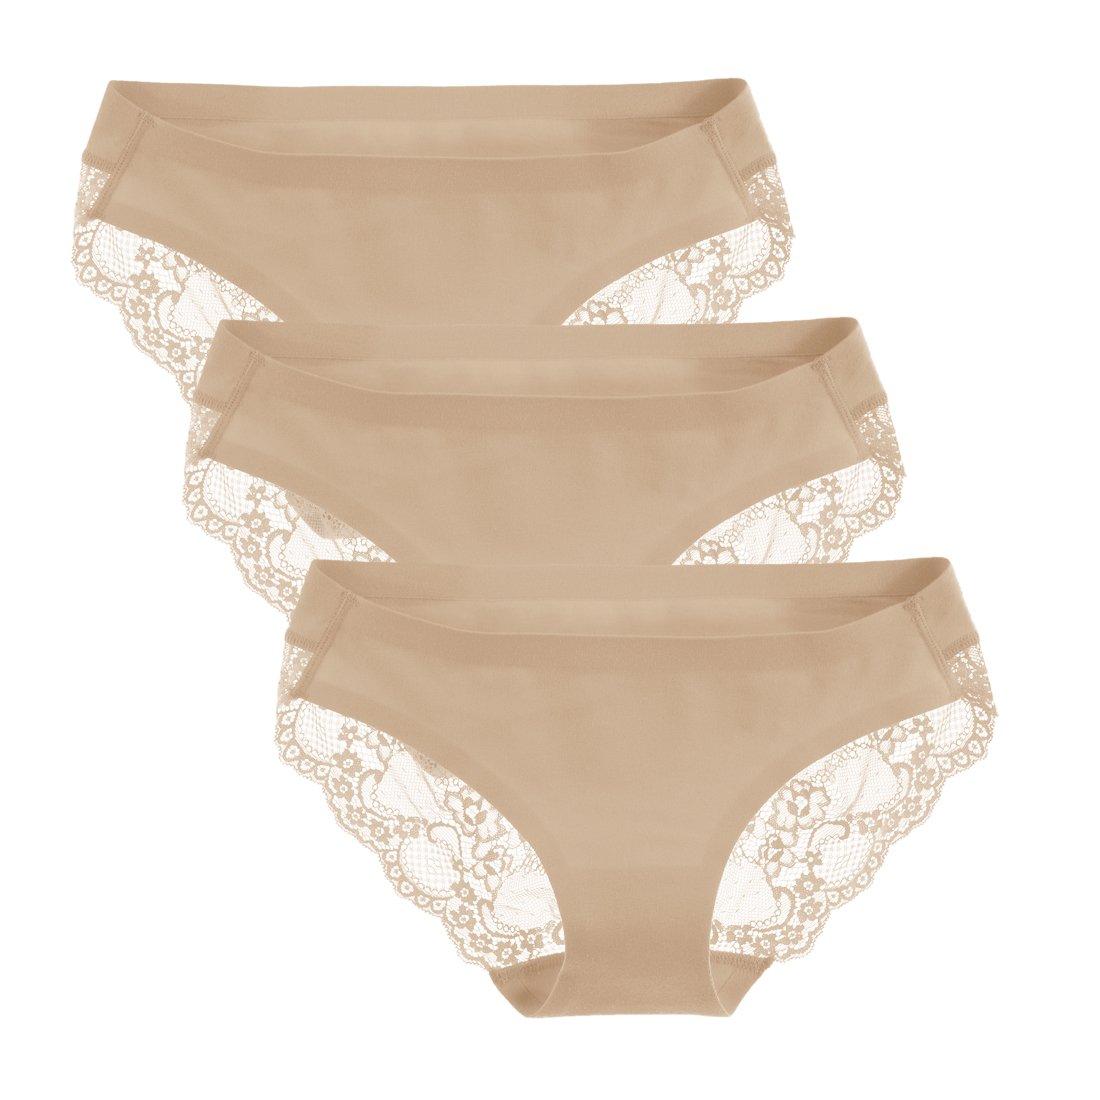 Liqqy Women's 3 Pack Low Rise Cotton Lace Coverage Bikini Panties Underwear (Small, Beige)